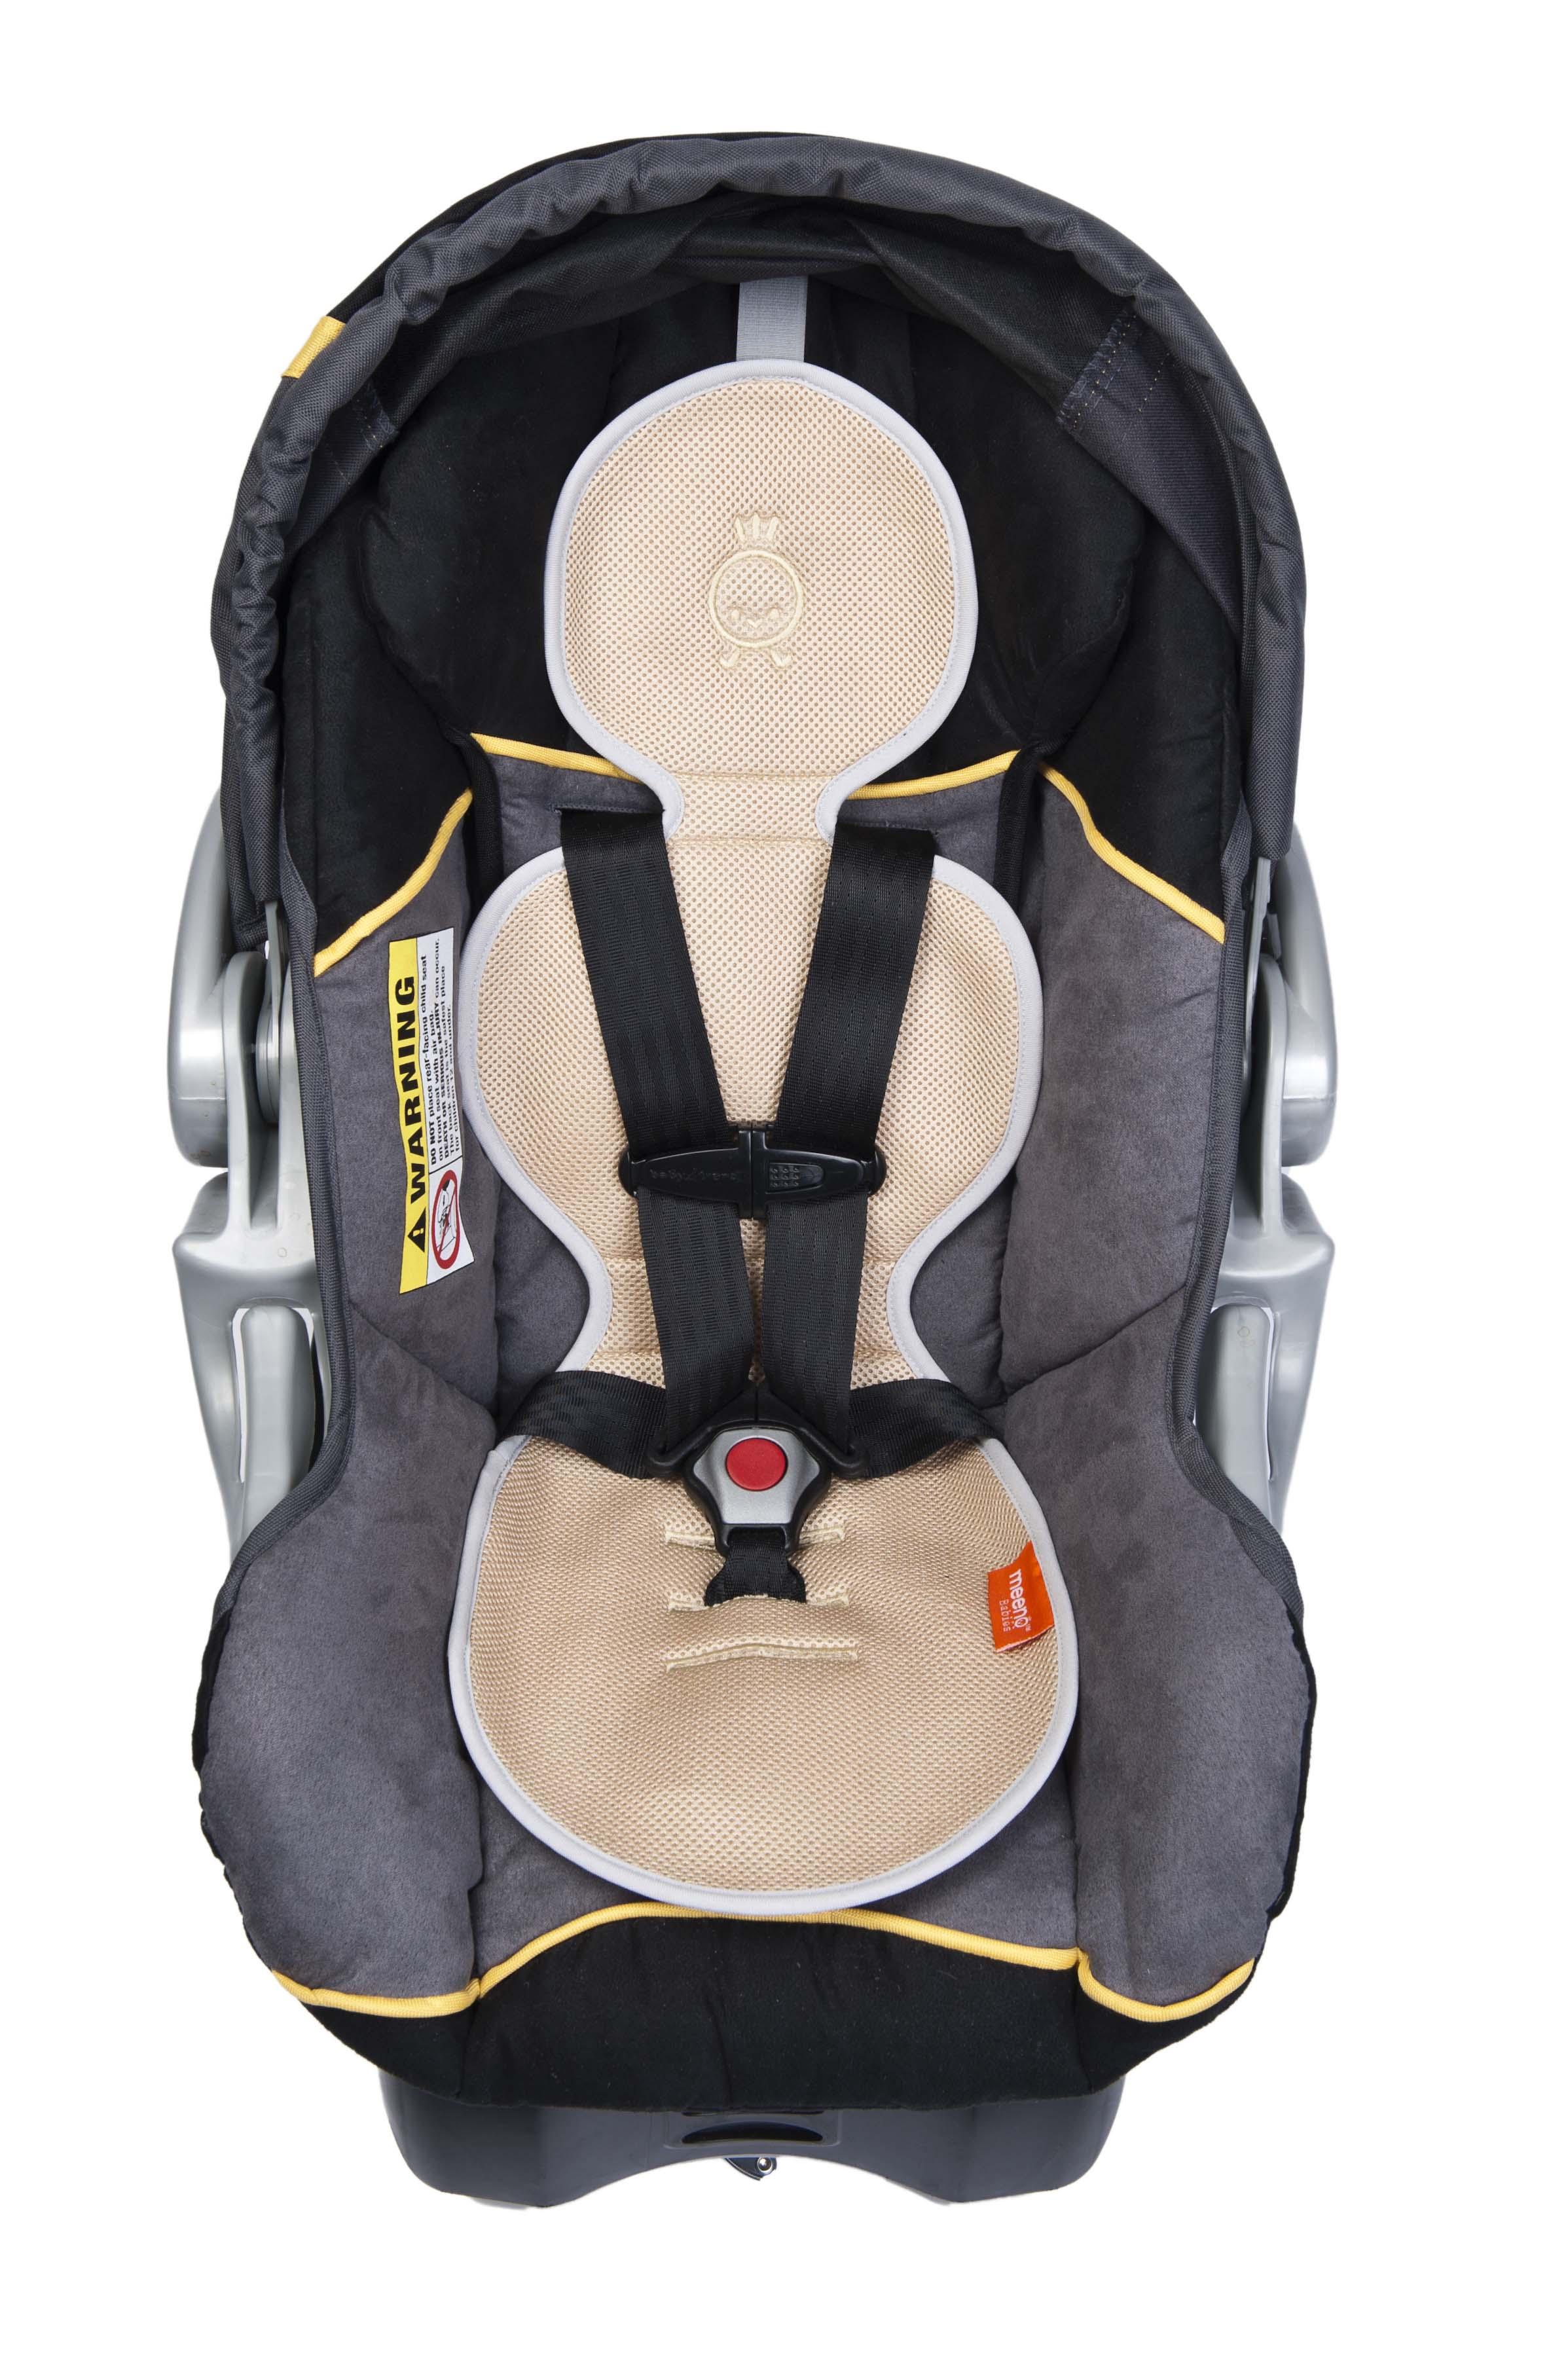 Baby Car Seat Cooling Pad Photos